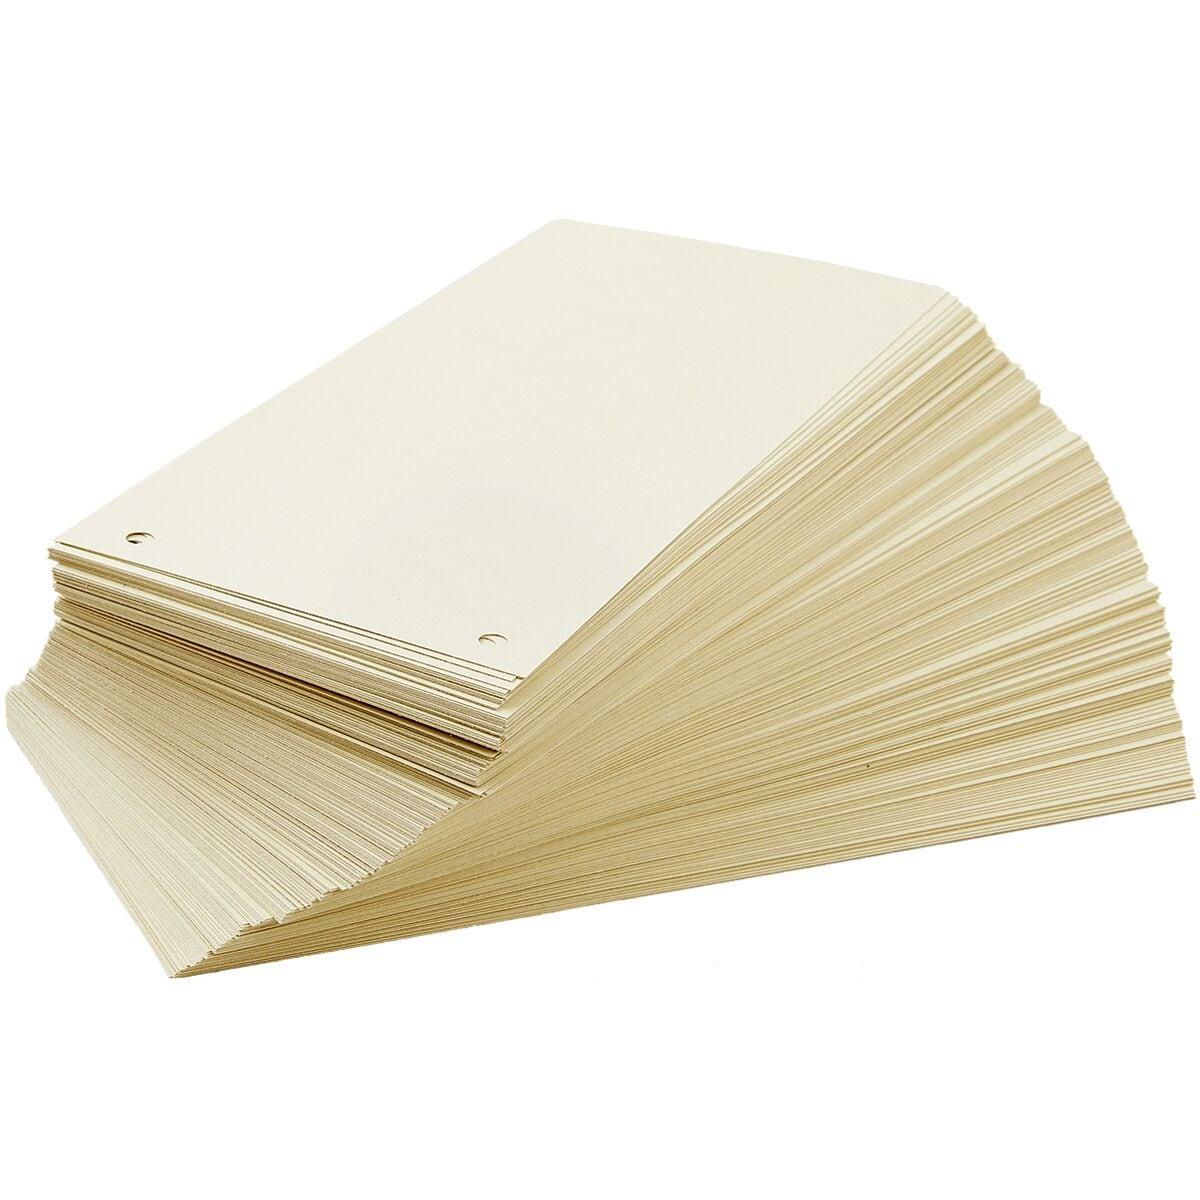 Trennstreifen OTTO Office Nature, Recycling-Karton Rechteck 24/10,5 cm, 200 Stück